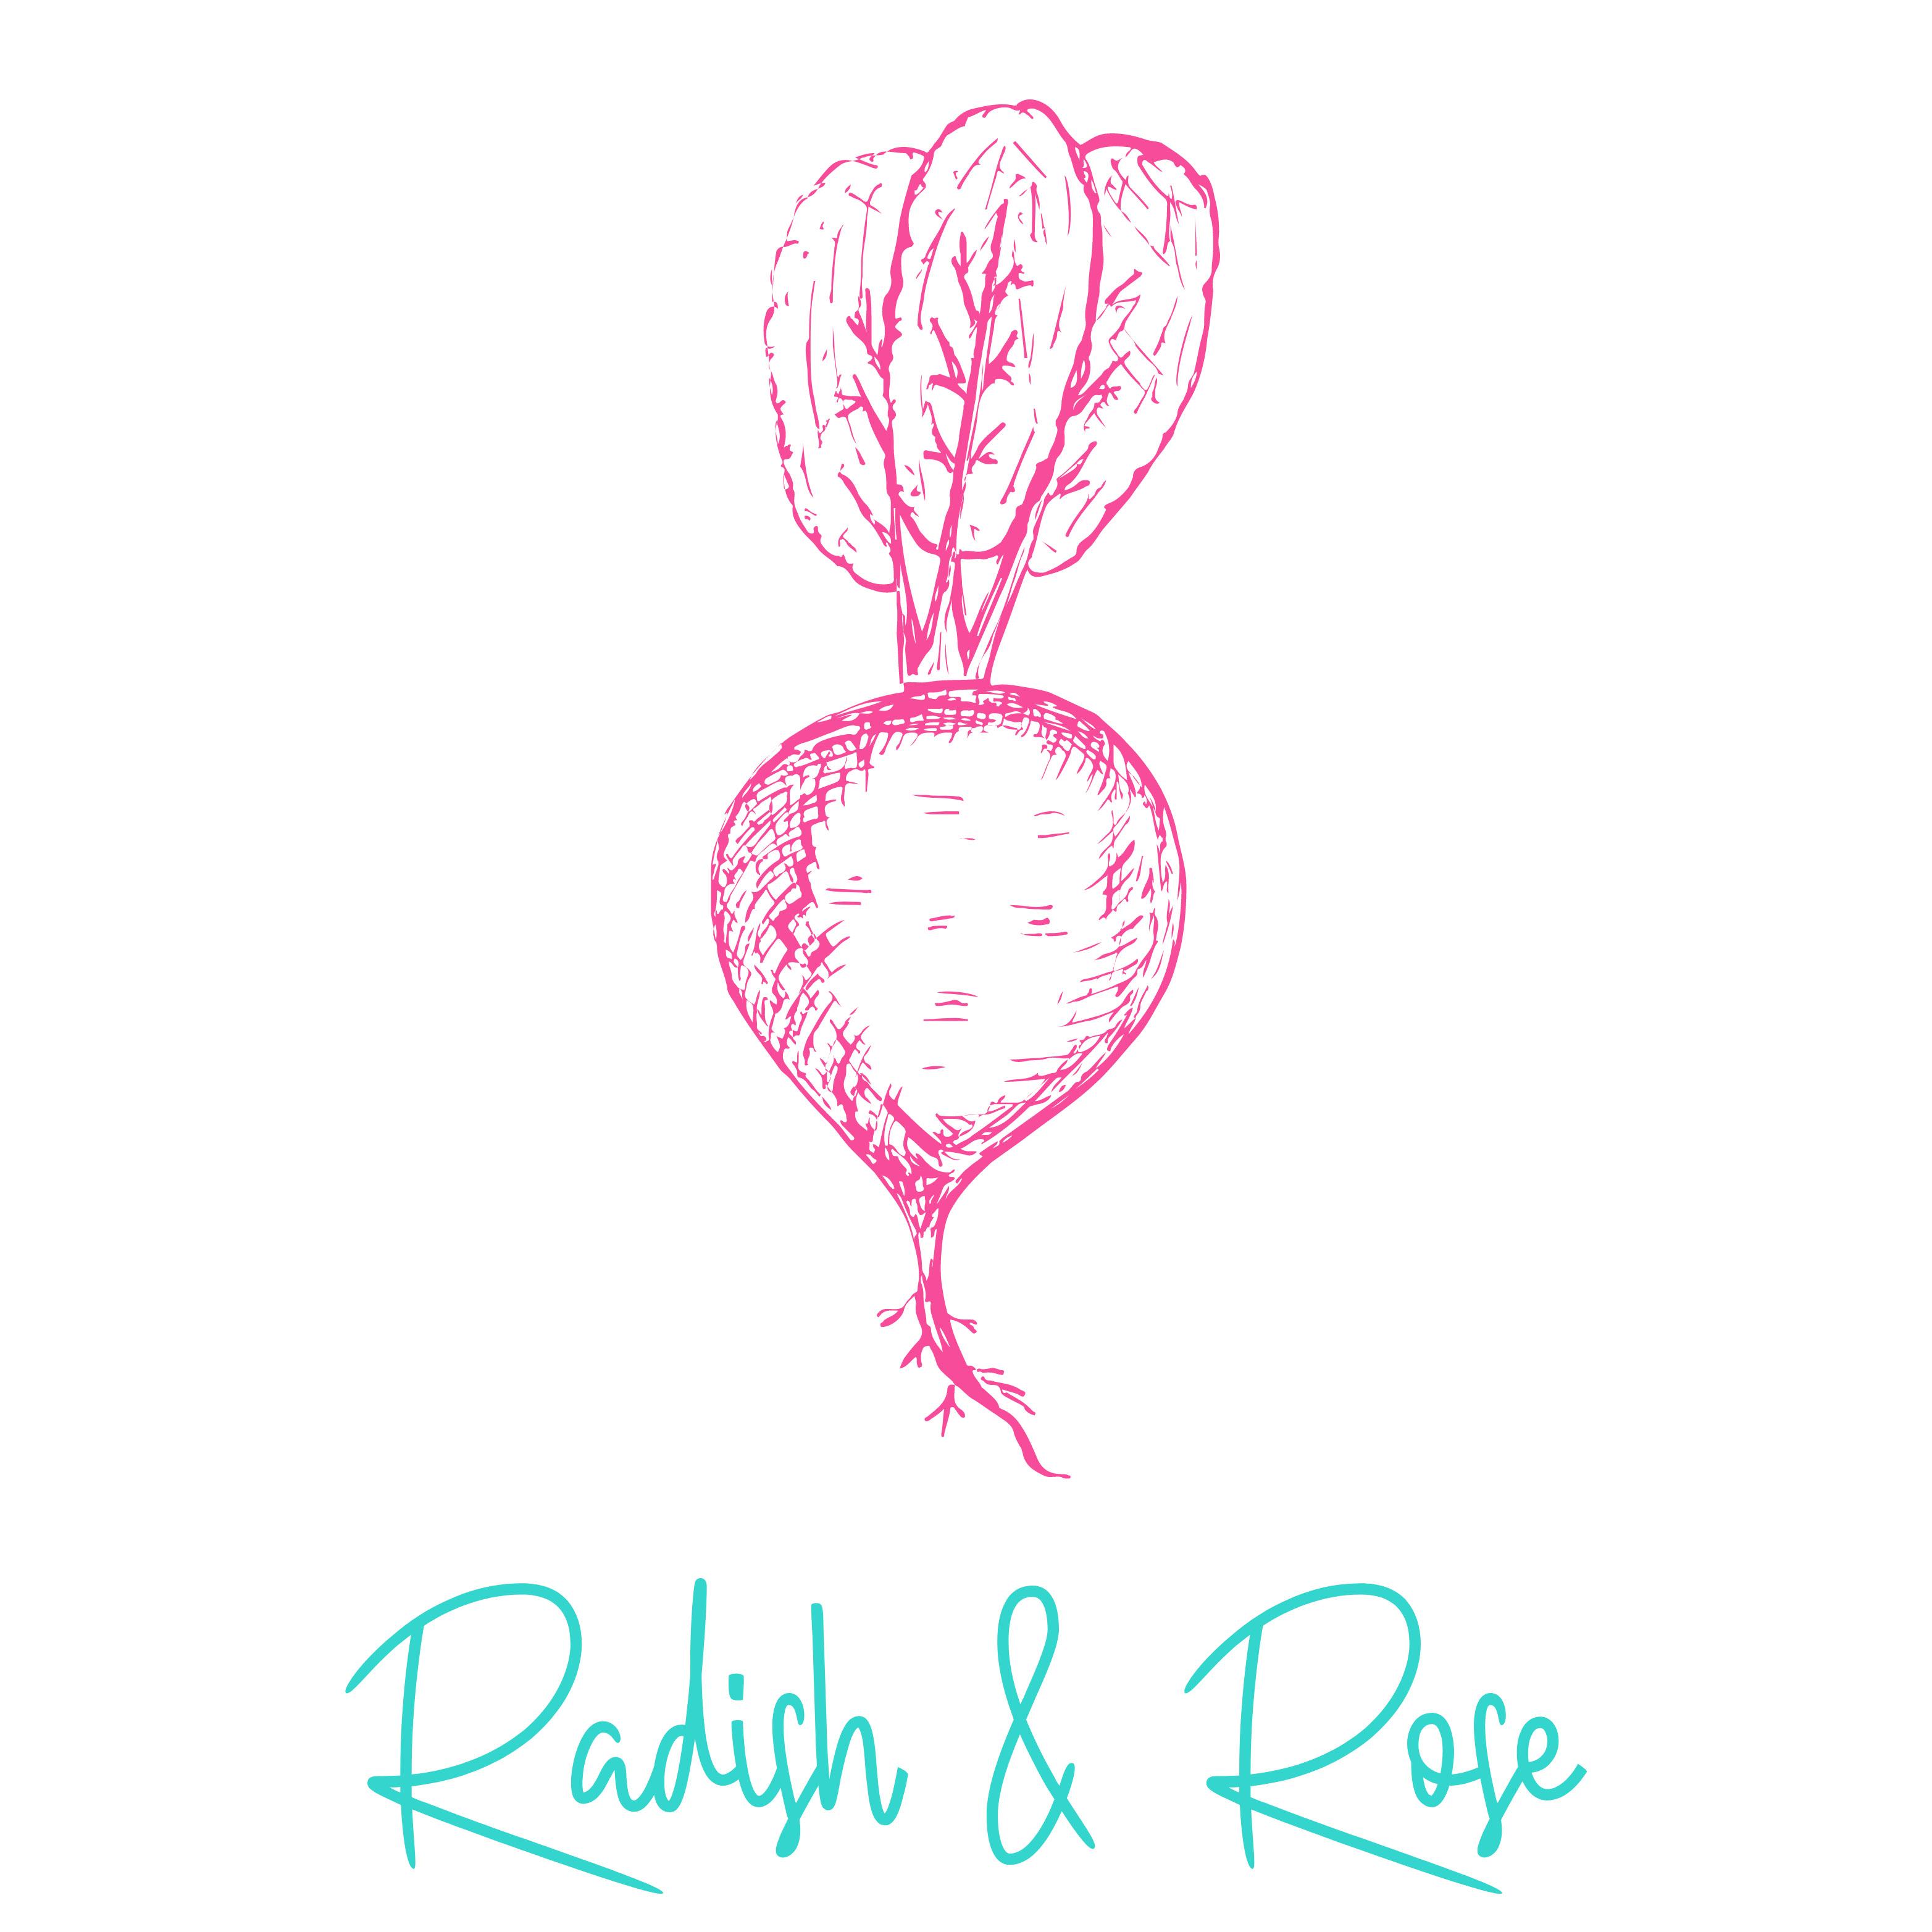 Events - Radish & Rose